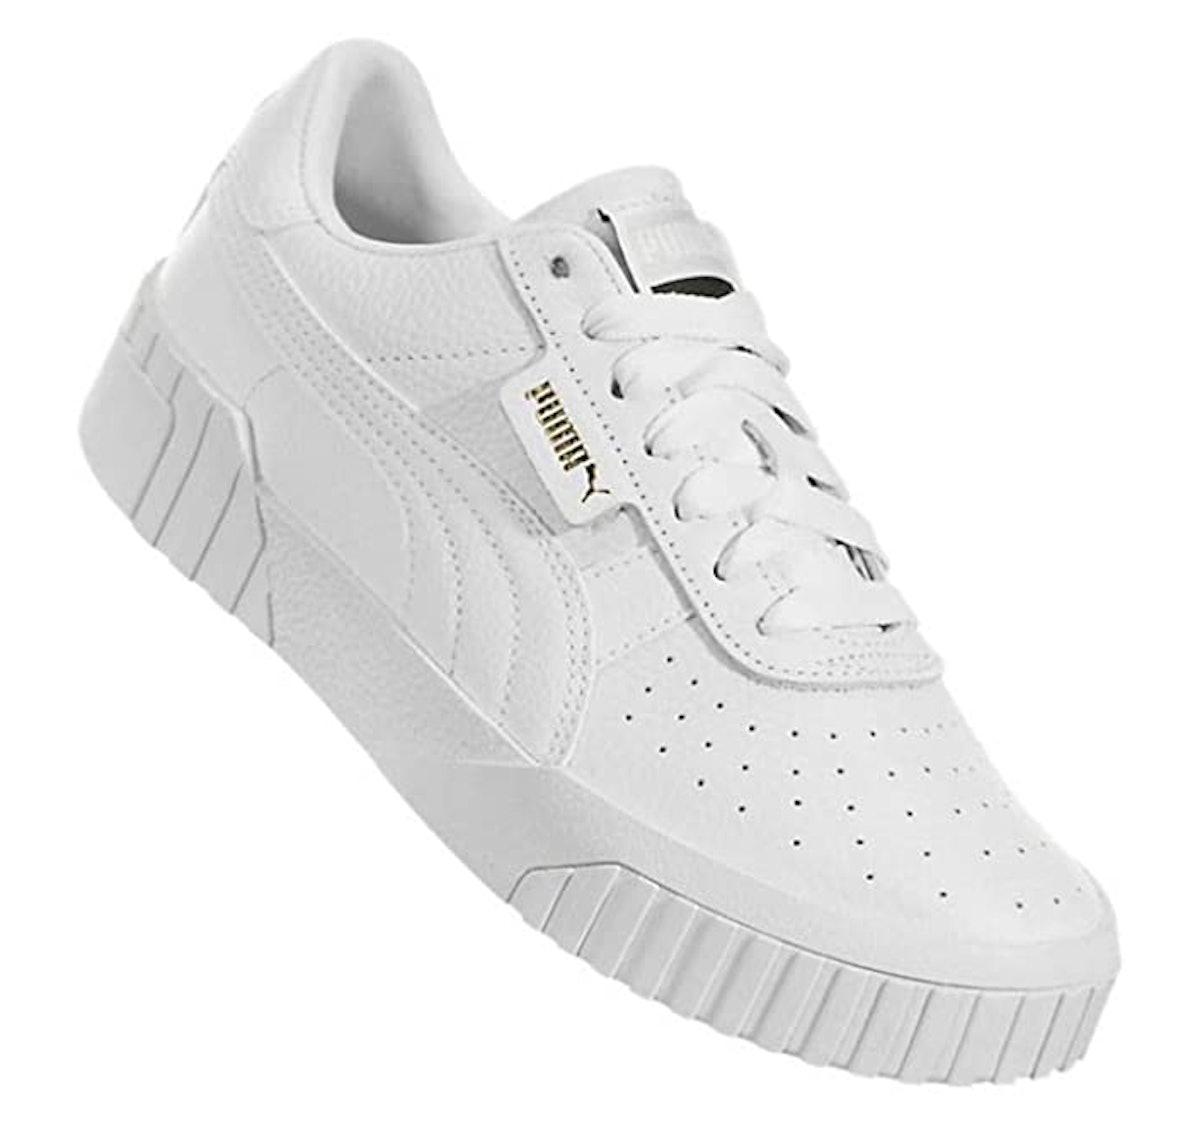 PUMA Women's Cali Sneaker